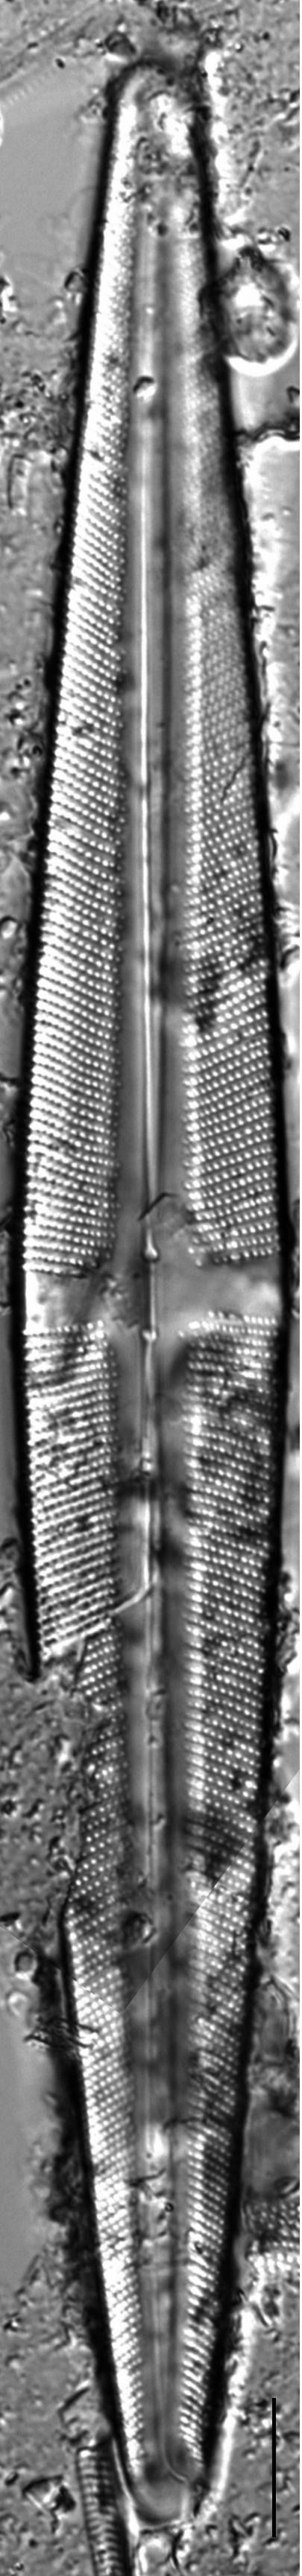 Stauroneis kingstonii LM1